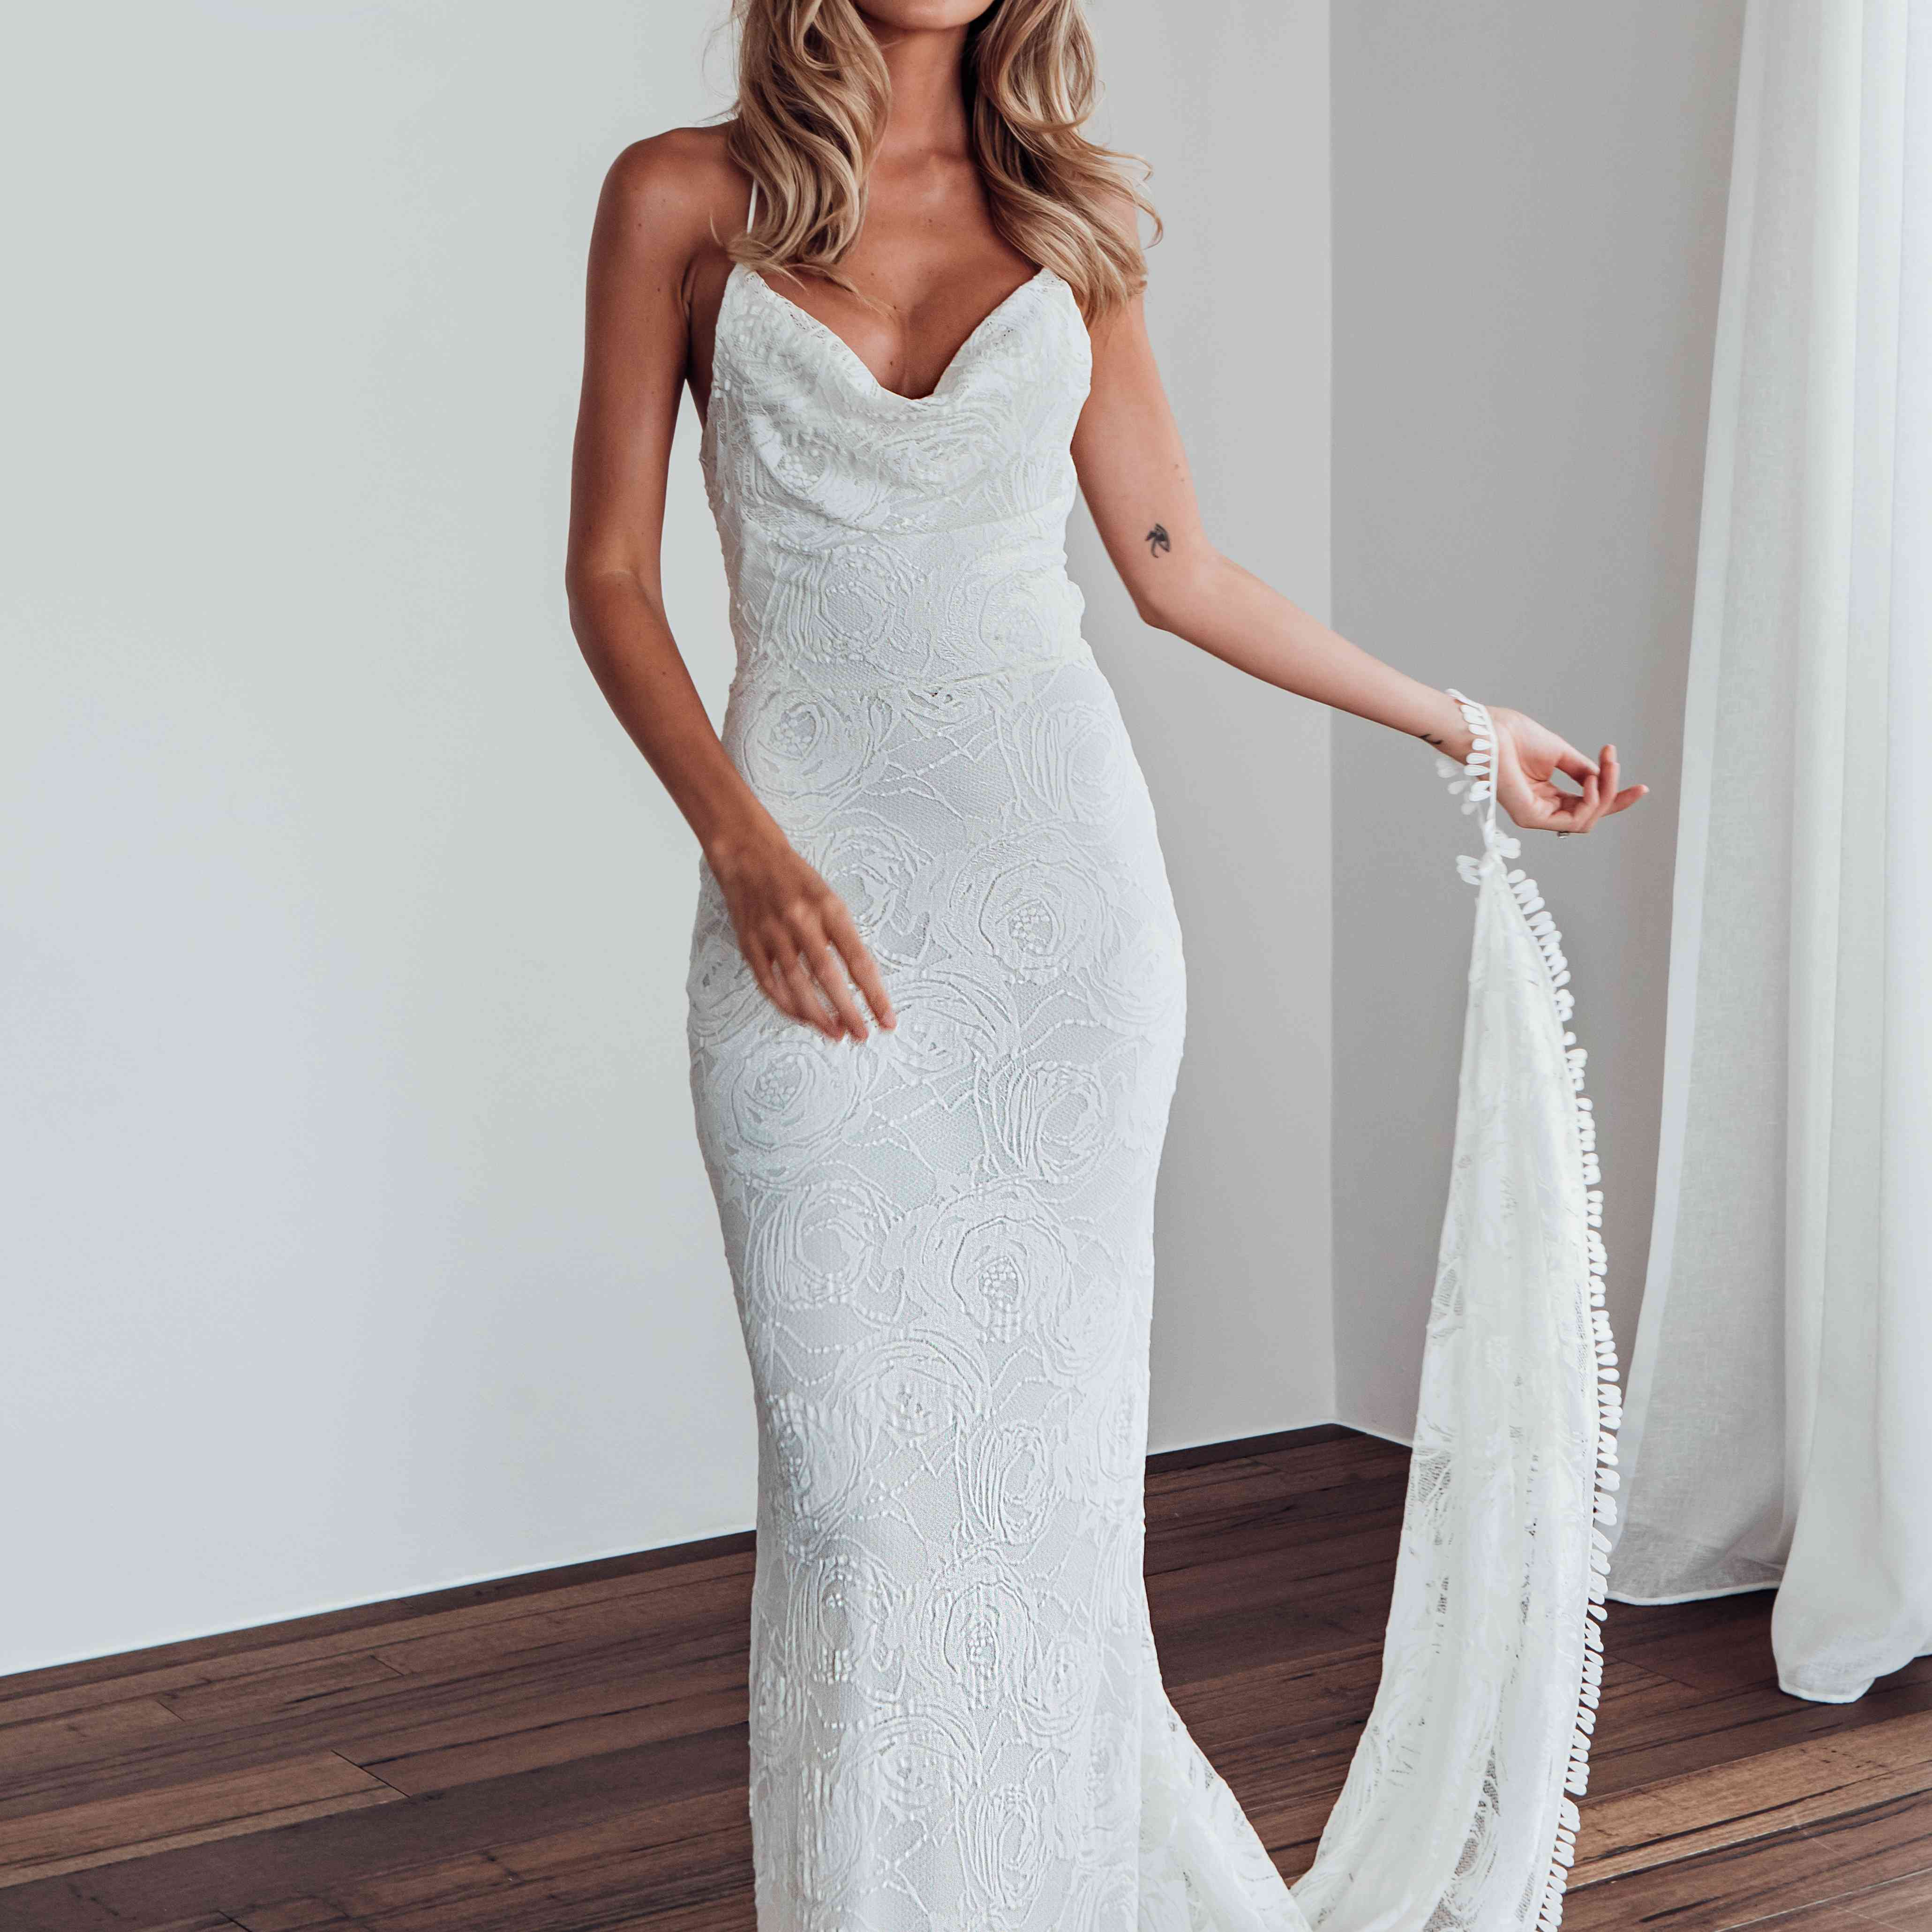 Honey Rose cowl neck wedding dress